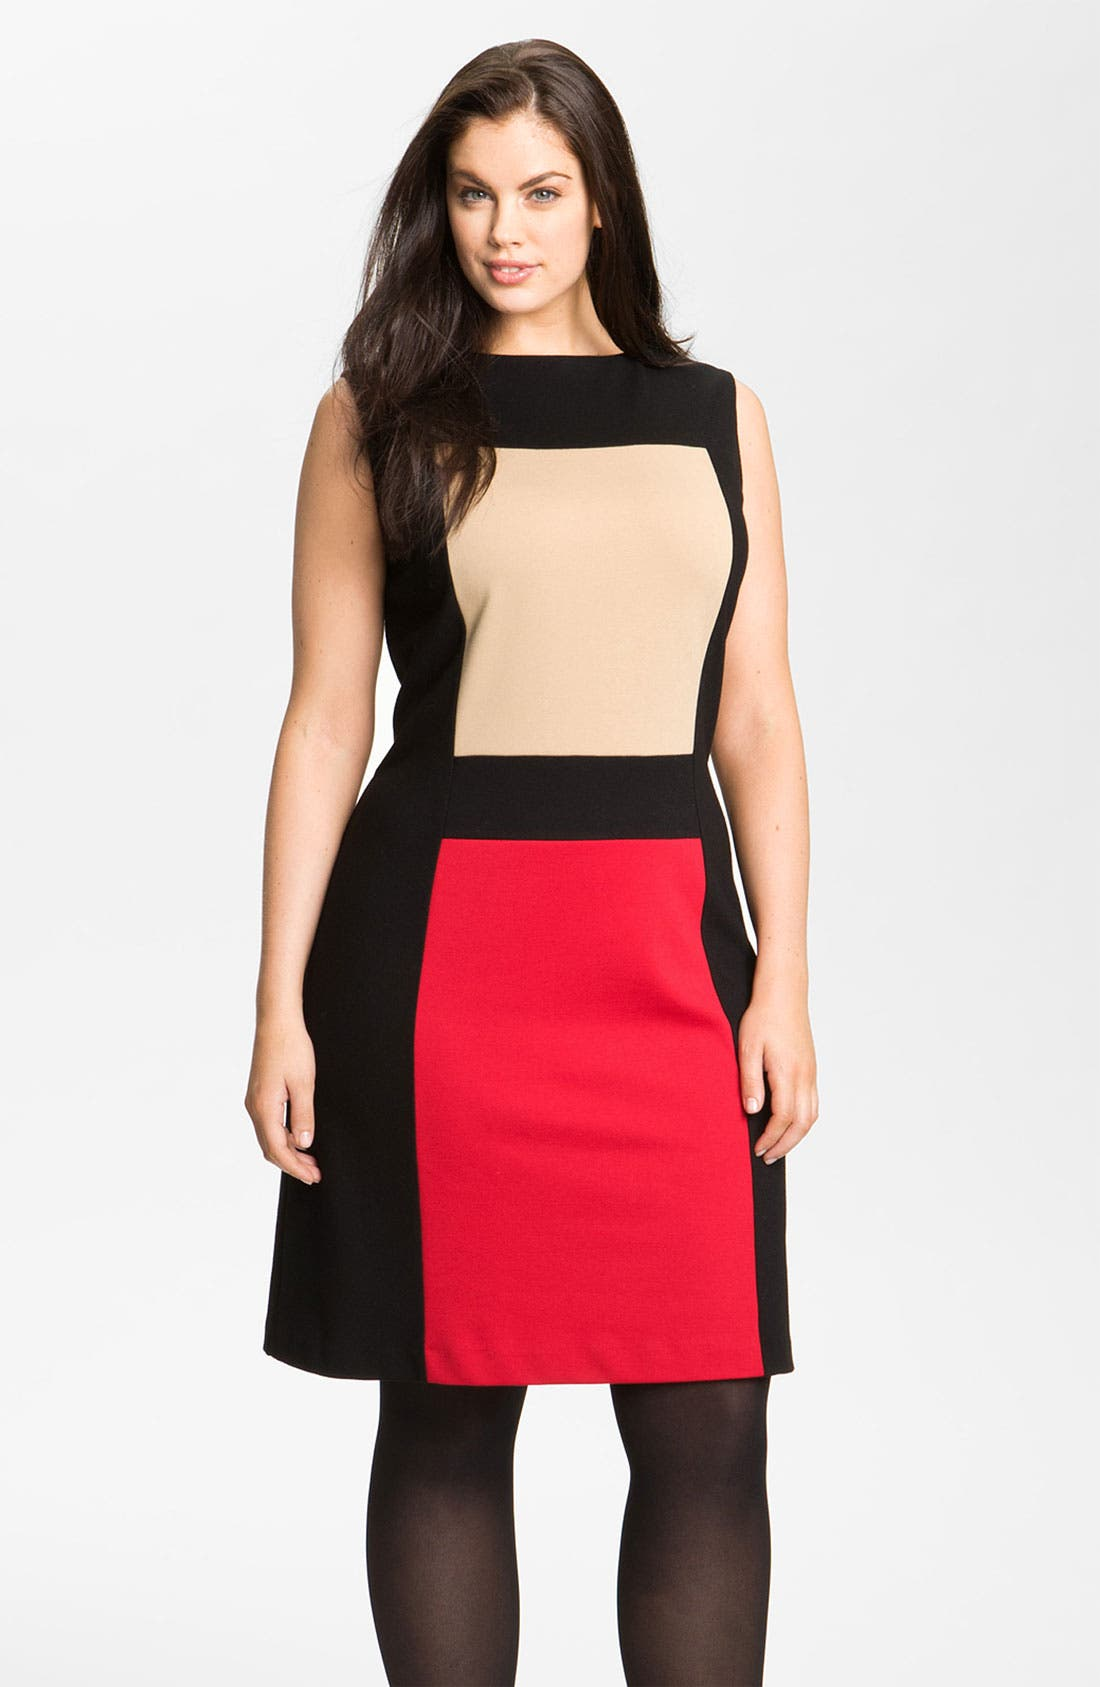 Alternate Image 1 Selected - Calvin Klein Colorblock Ponte Knit Sheath Dress (Plus)